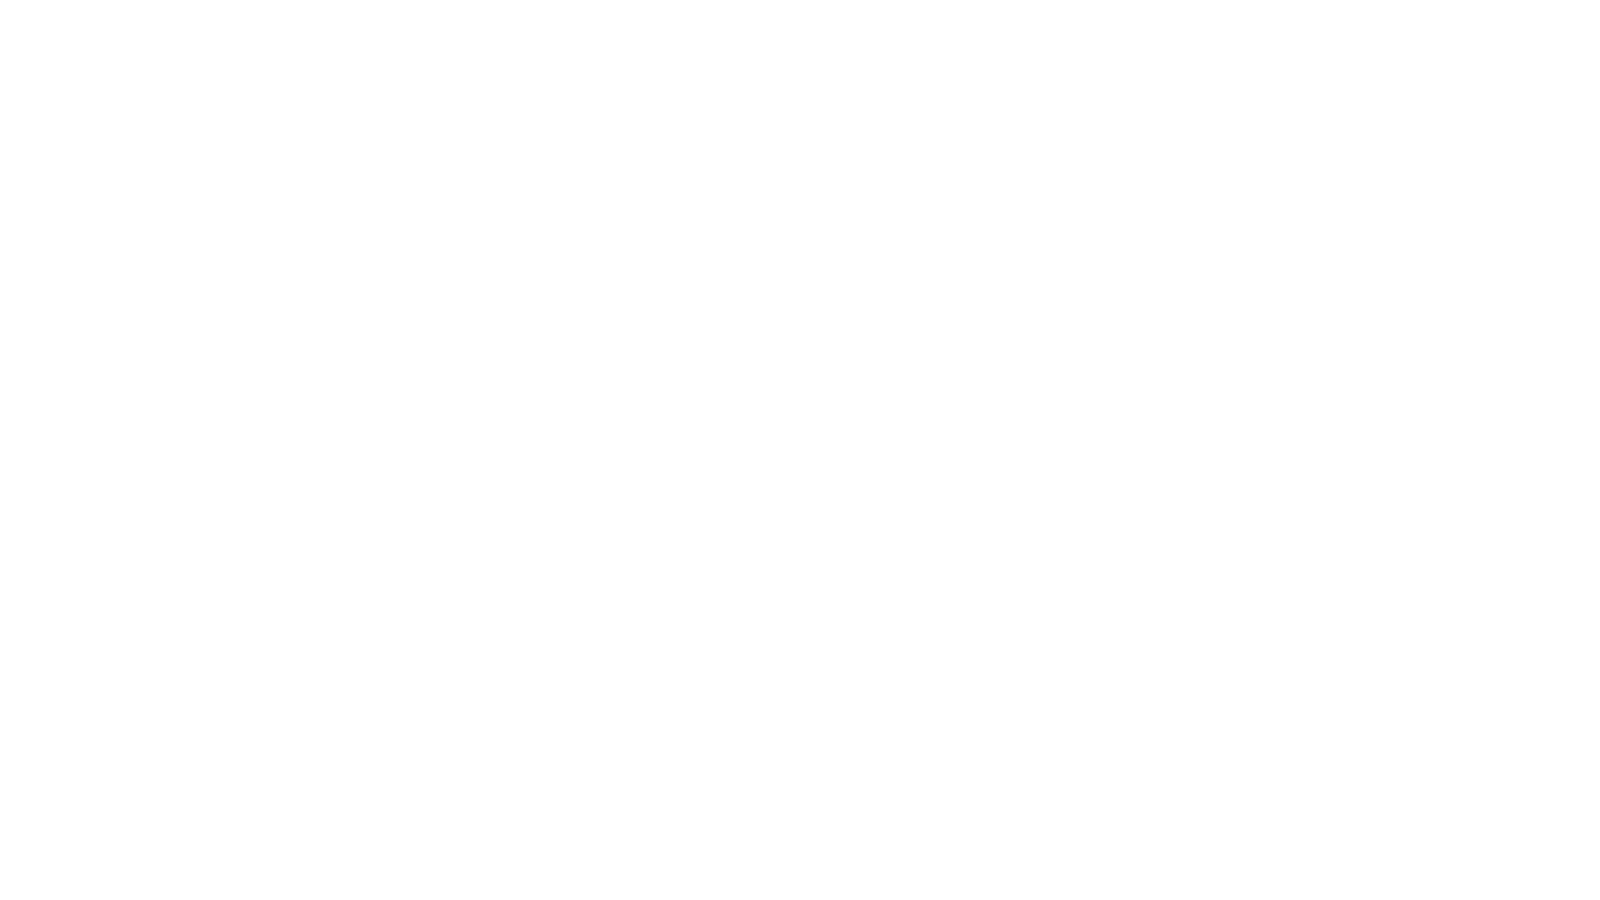 Hai teman teman  balik lagi nih bersama kita sahabat RIAU INTERNATIONAL COLLEGE  hari ini kita memberikan satu ayng spesial ni... yakni Company Profile kita di 2021... yuk mari berikan tanggapan kalian   source of footage  https://www.youtube.com/watch?v=dhtSfHoWbIU - BroSisPKU Channel https://www.youtube.com/watch?v=5azL0oDuxTg&t=1s - Drone Skyline ID Channel https://www.youtube.com/watch?v=t_jOUfcTWSs - Jck Tv Channel https://www.youtube.com/watch?v=KrwKAcEdjGM - BNI Syariah Cirebon Channel   jangan lupa untuk terus dukung ya.....   More about us  email  : riauinternationalcollege@gmail.com IG  : https://www.instagram.com/riauinternationalcollege/ FB  : https://www.facebook.com/riauinternationalcollegepku Maps  : https://goo.gl/maps/FT4wEHp5yAFjoELJ7 web  : https://ric.or.id blog  : http://riaucollege.blogspot.com